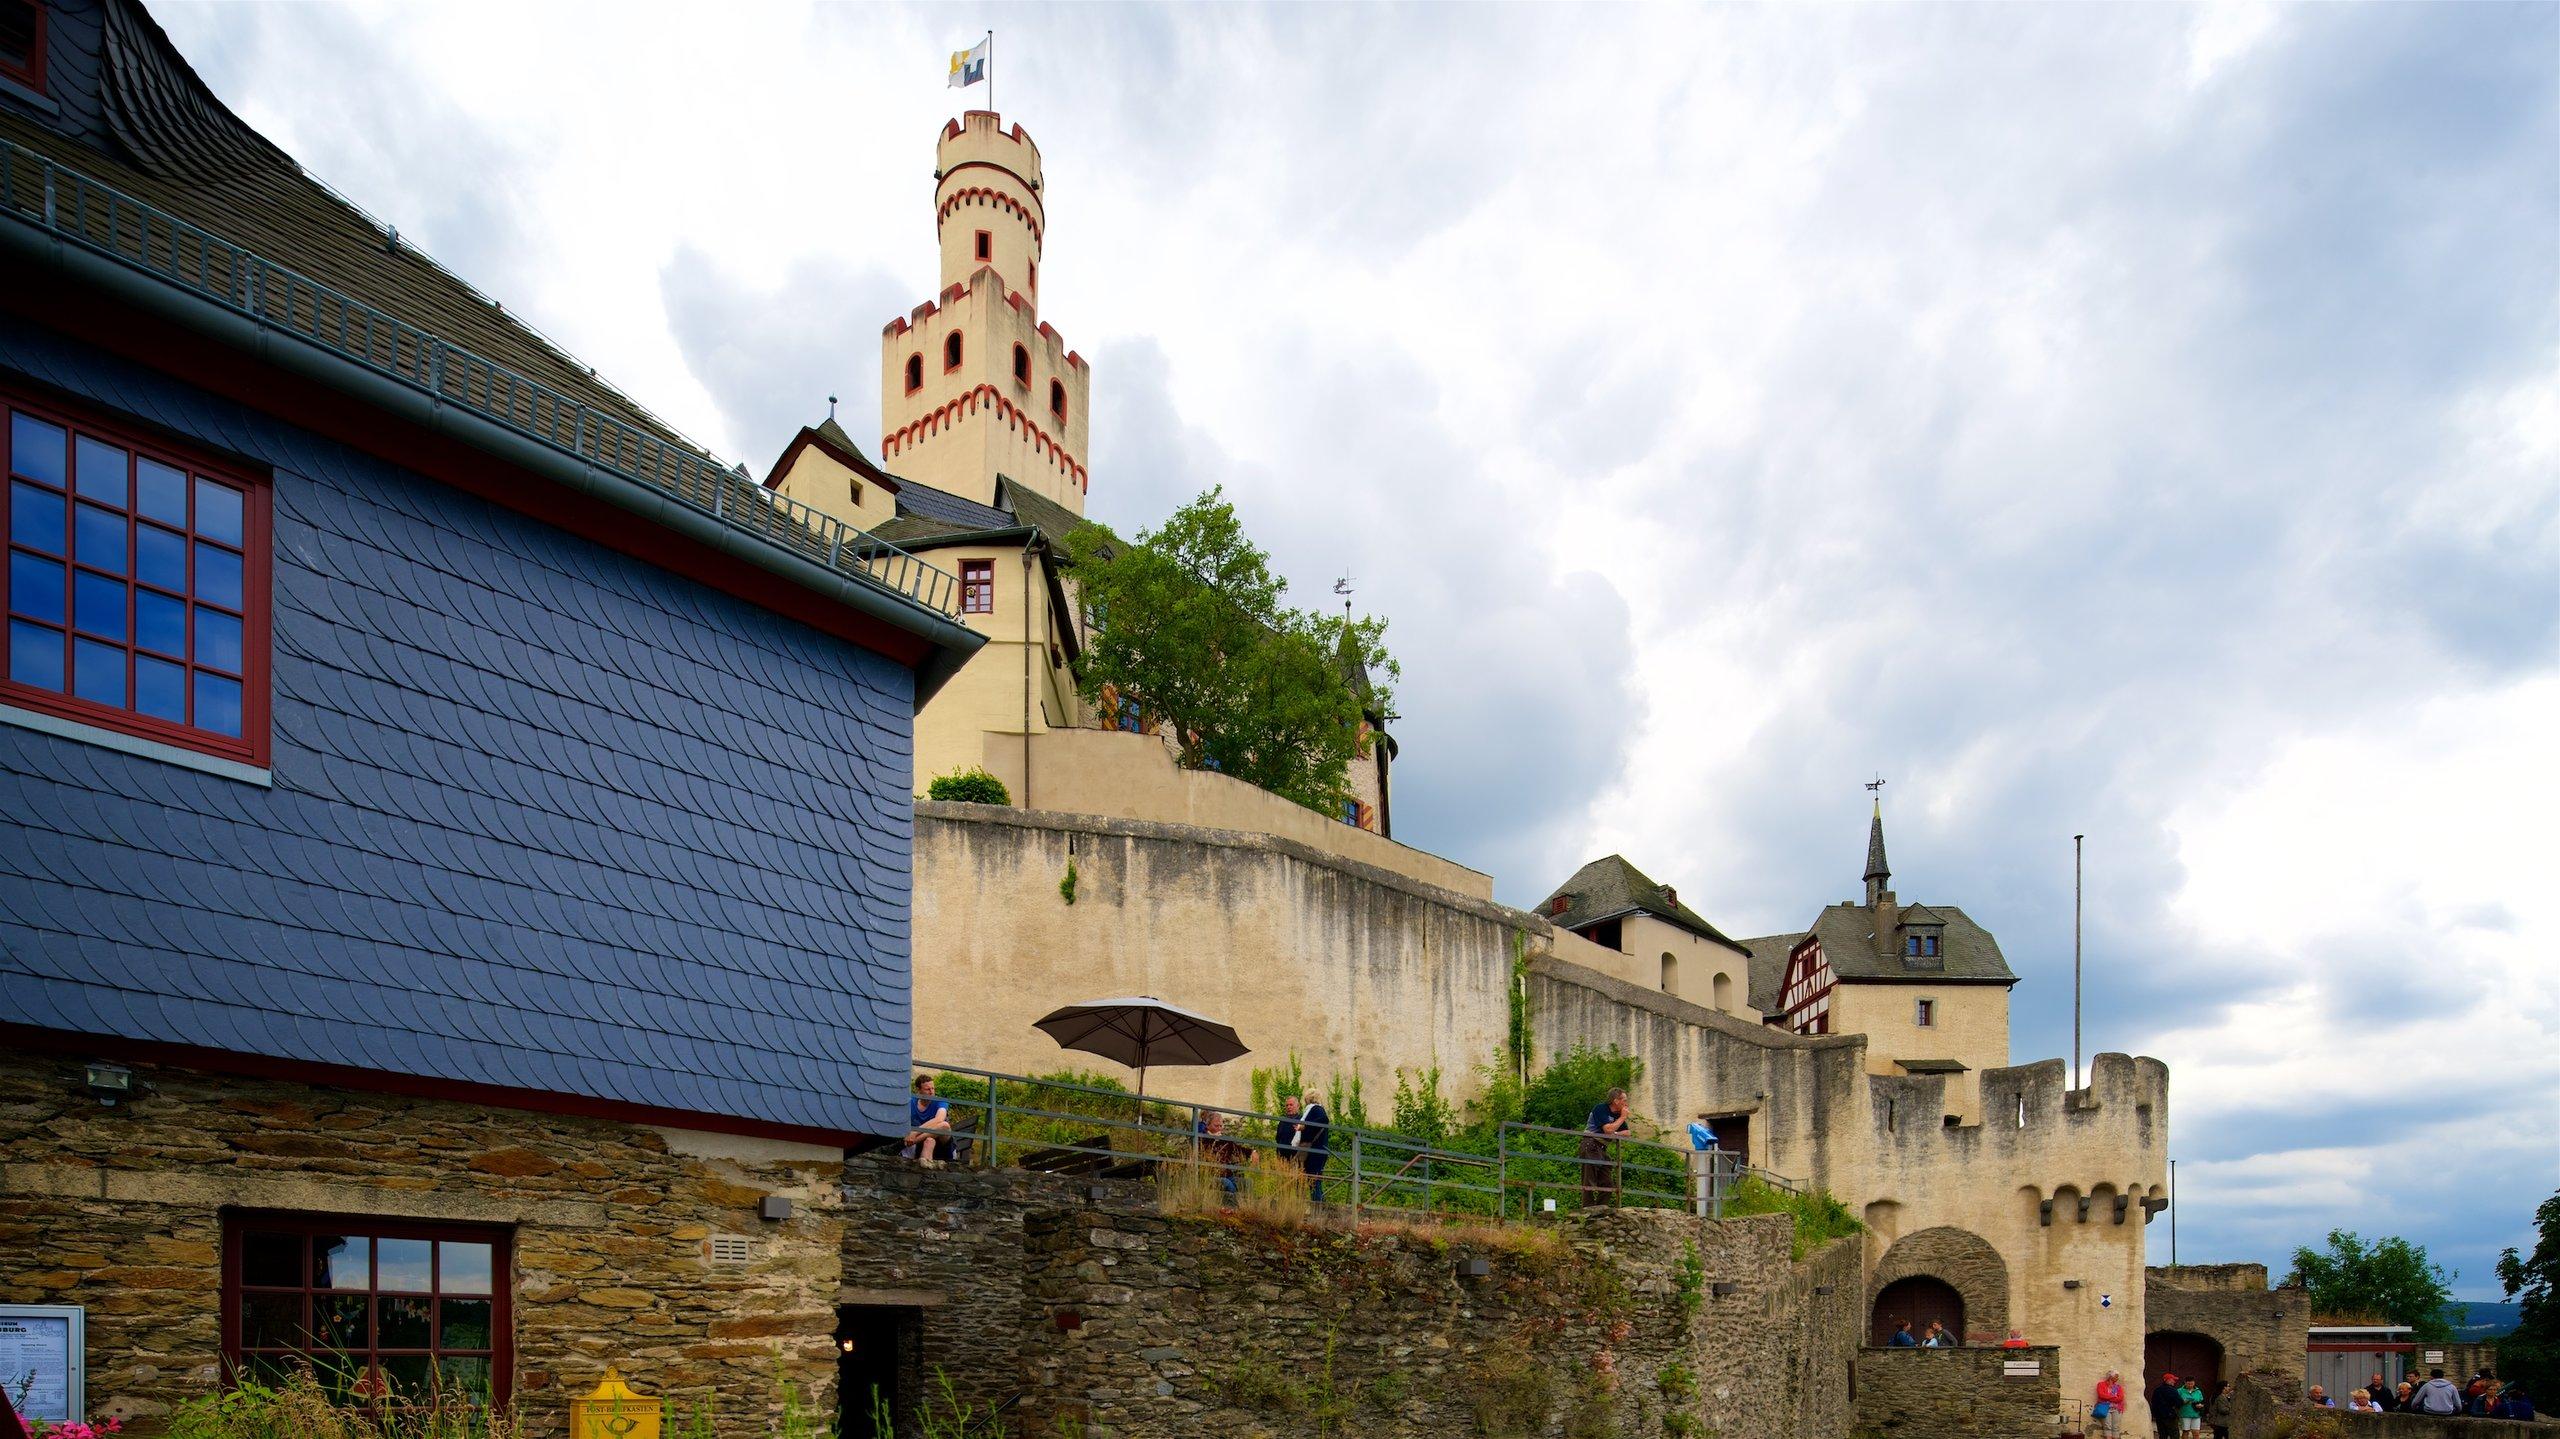 Marksburg Castle, Braubach, Rhineland-Palatinate, Germany